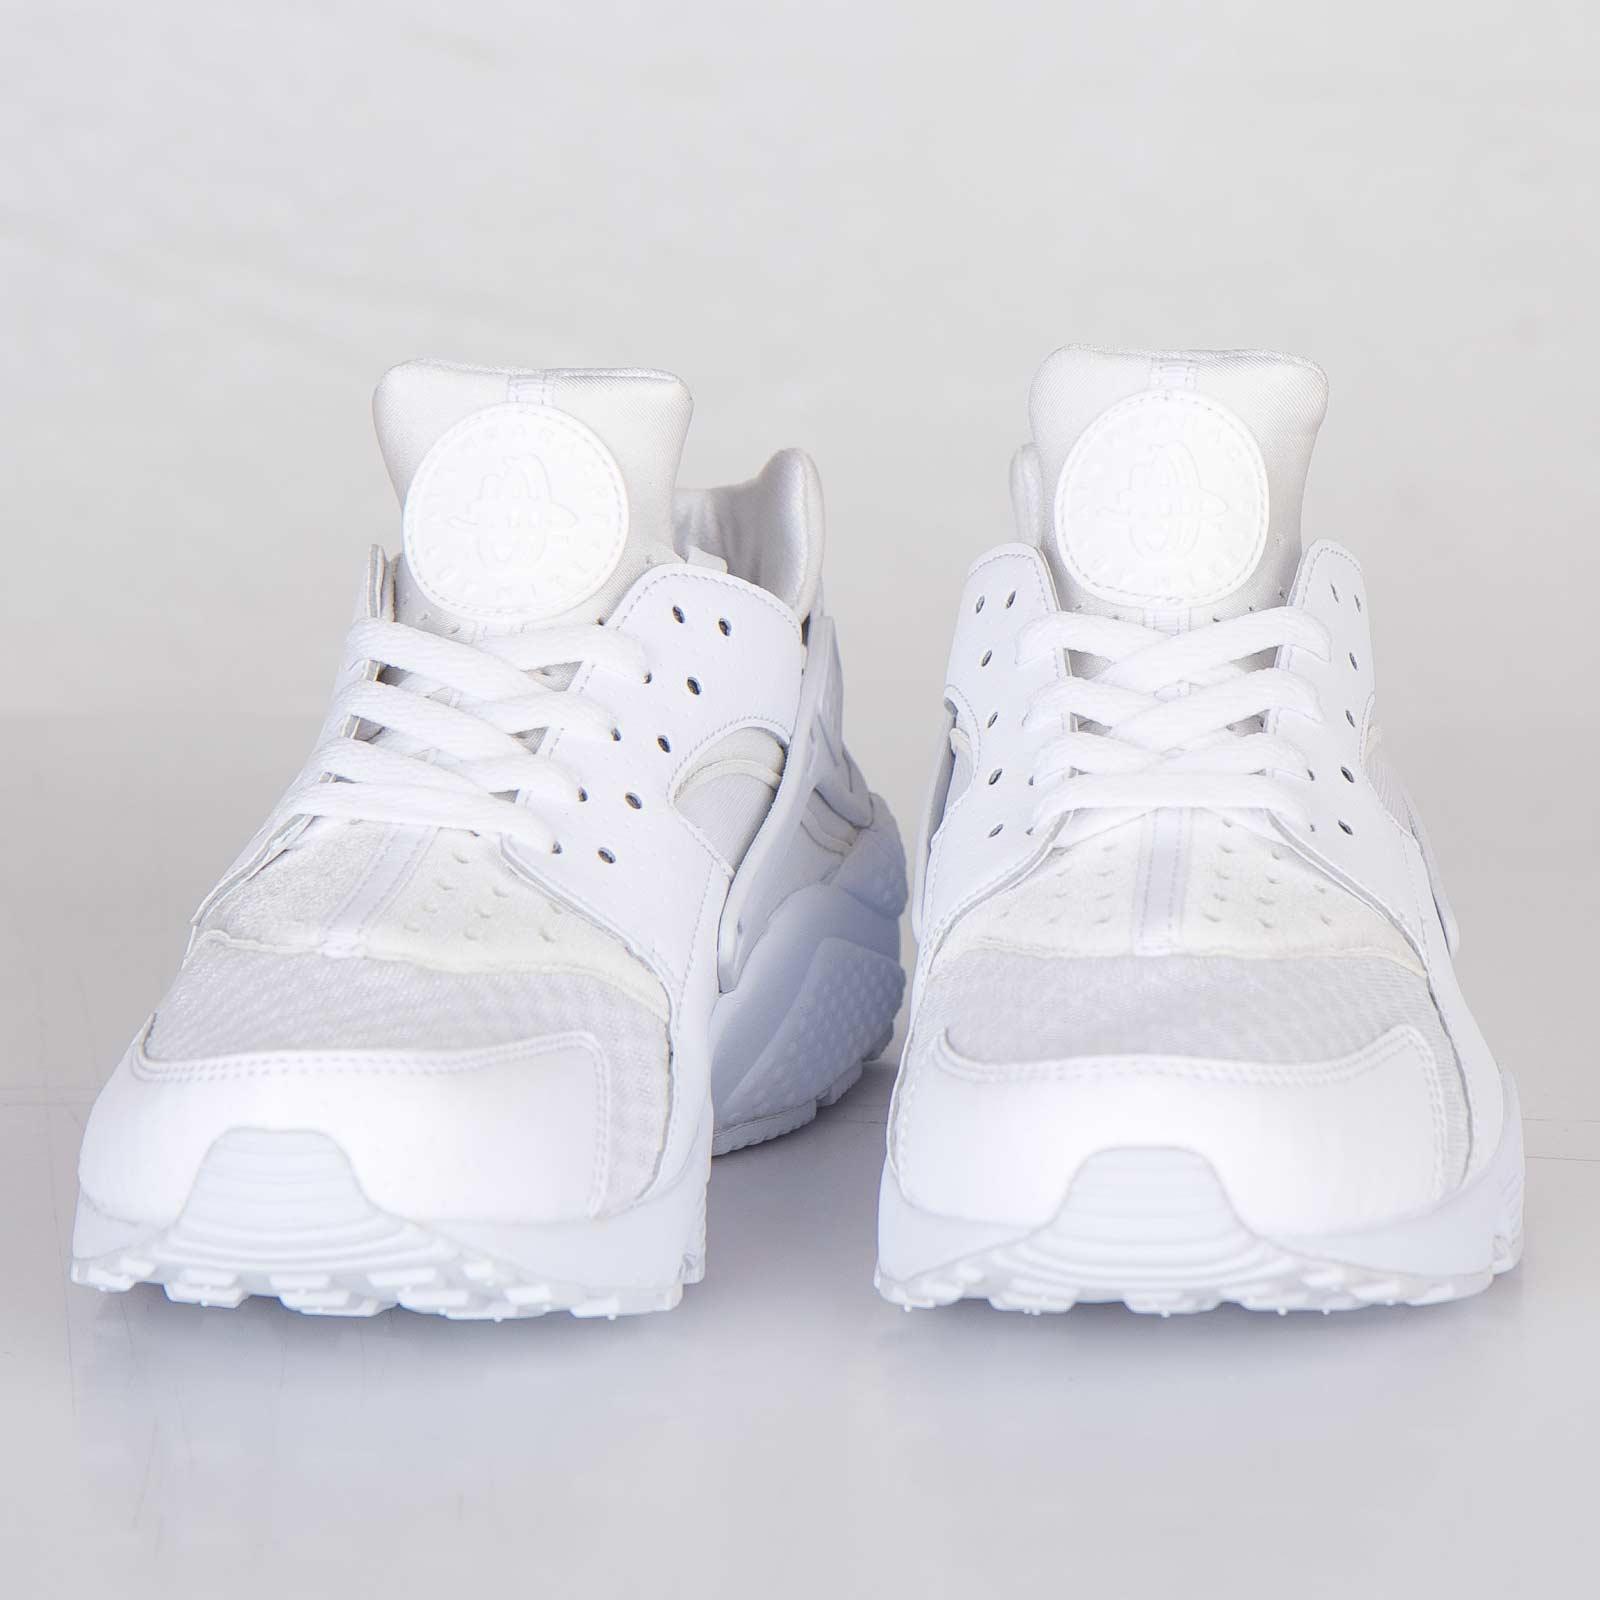 reputable site 61a89 9a966 Nike Air Huarache - 318429-111 - Sneakersnstuff   sneakers   streetwear  online since 1999